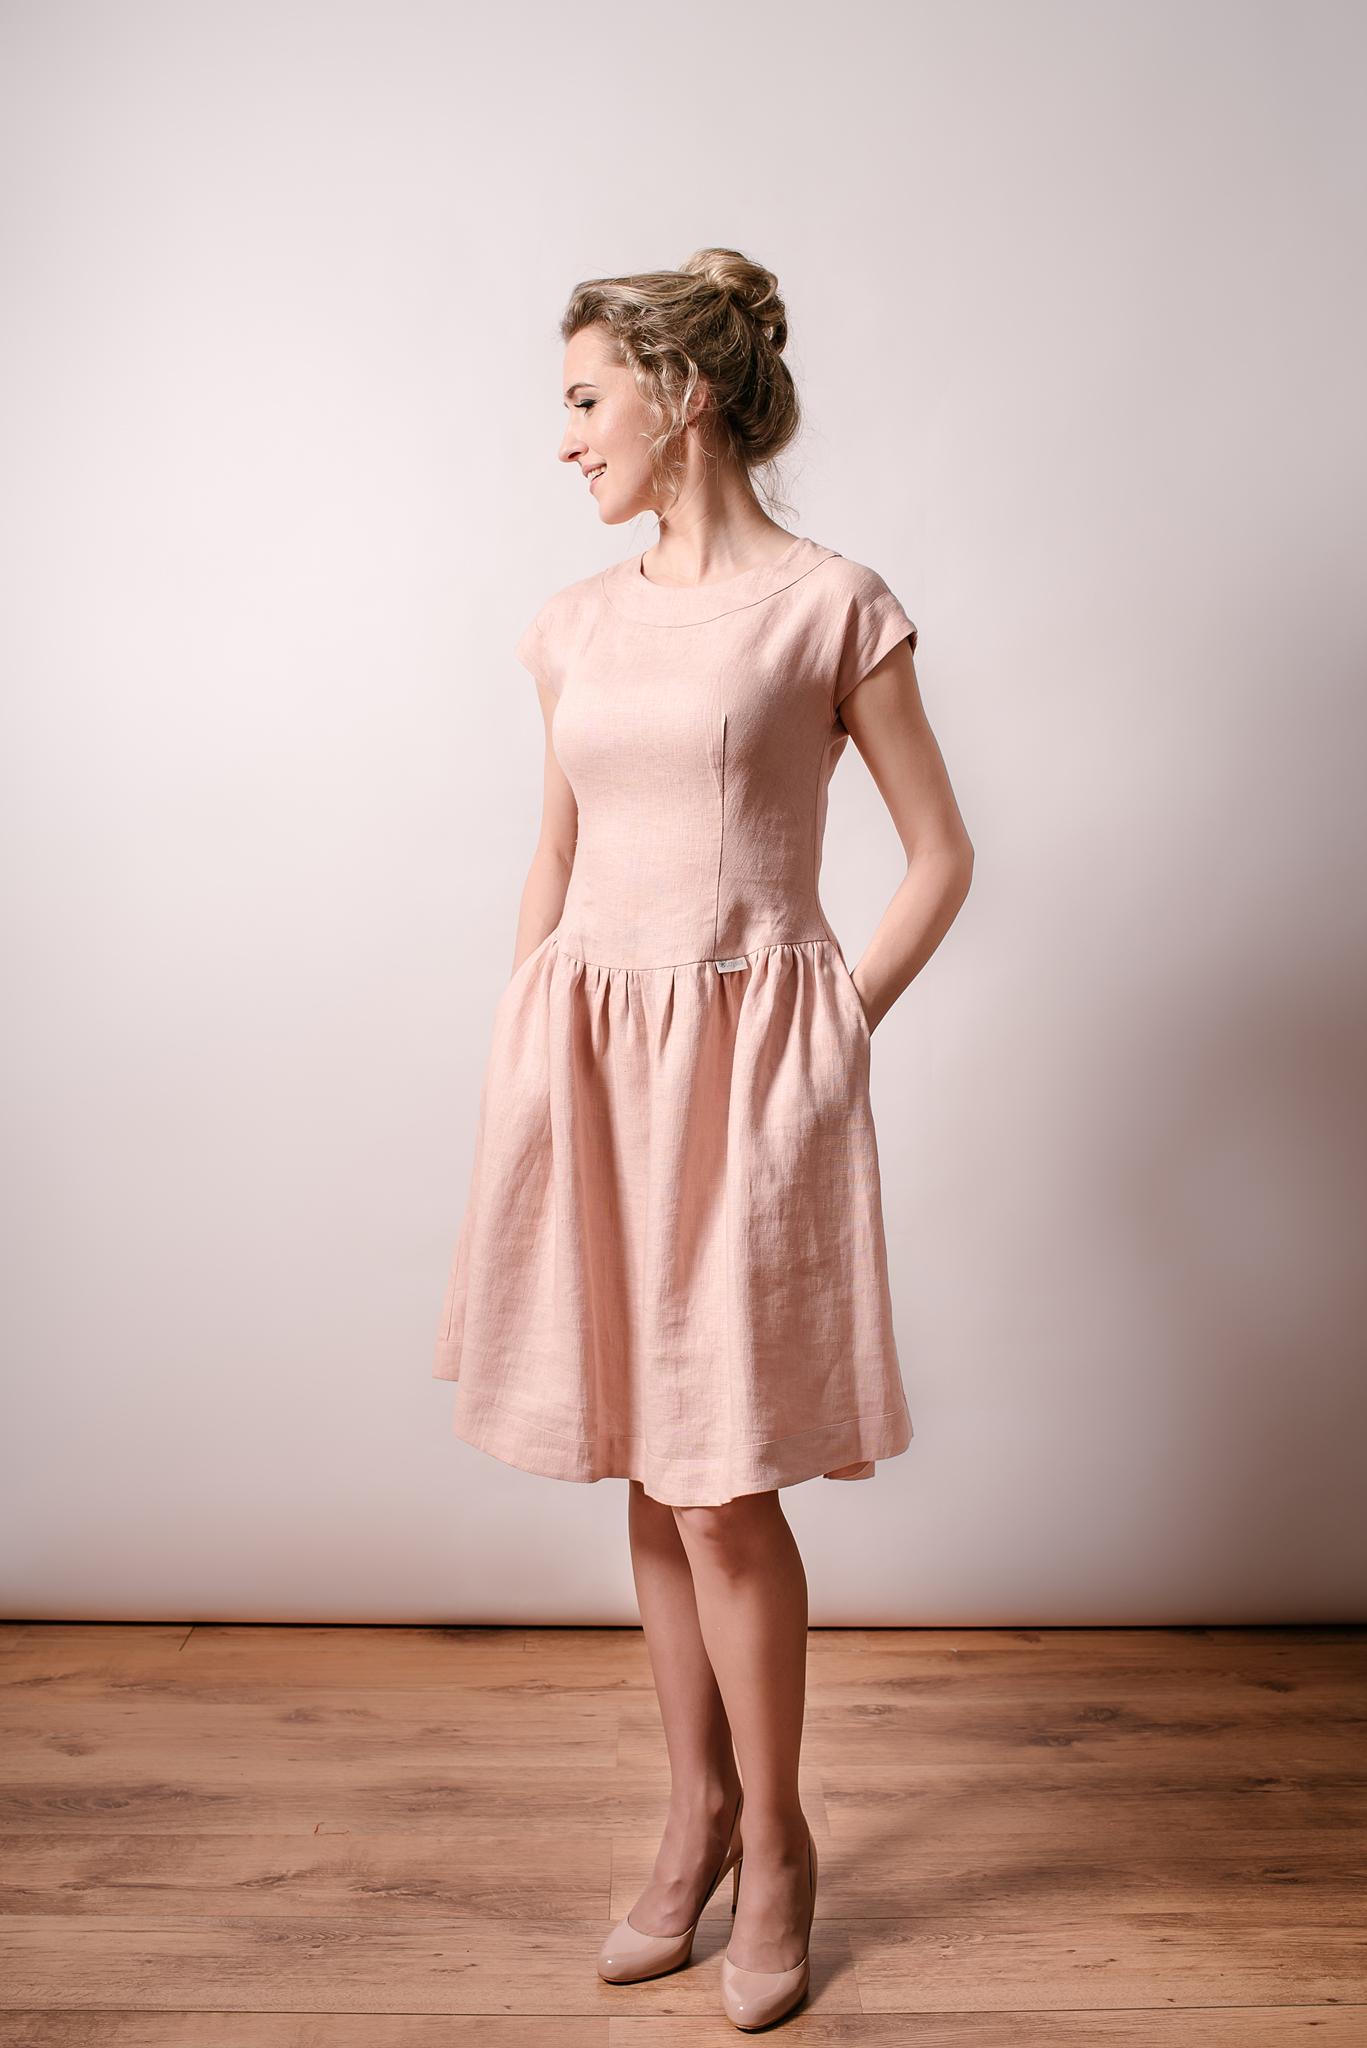 Linen ash rose dress/romantic dress/summer dress/tight fitting/short ...